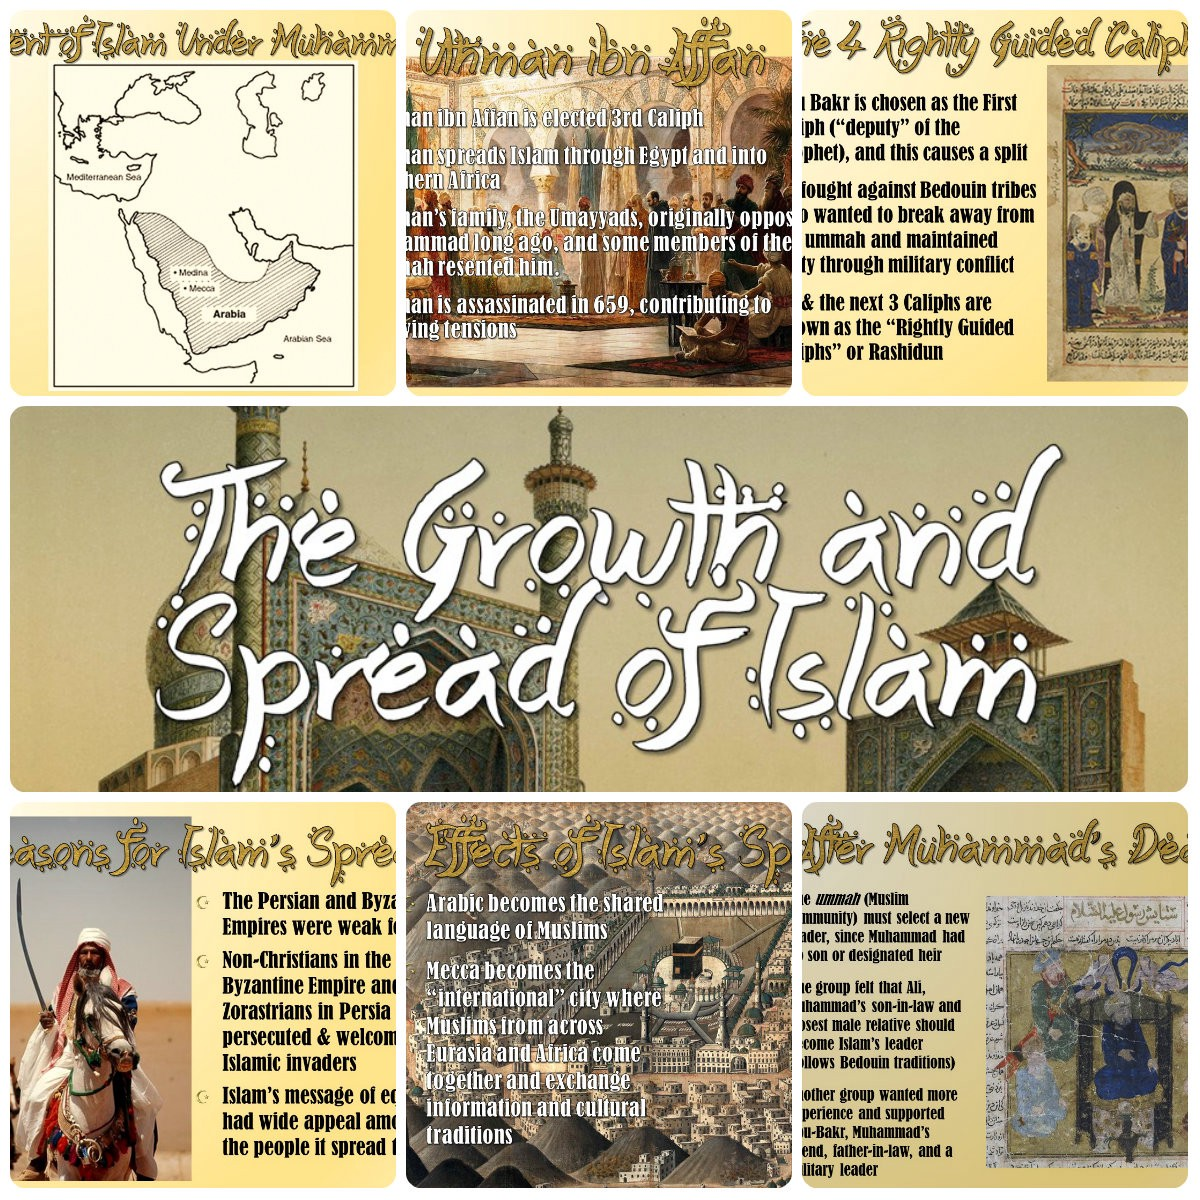 Islam Growth Amp Spread Of Islamic Civilizations Powerpoint